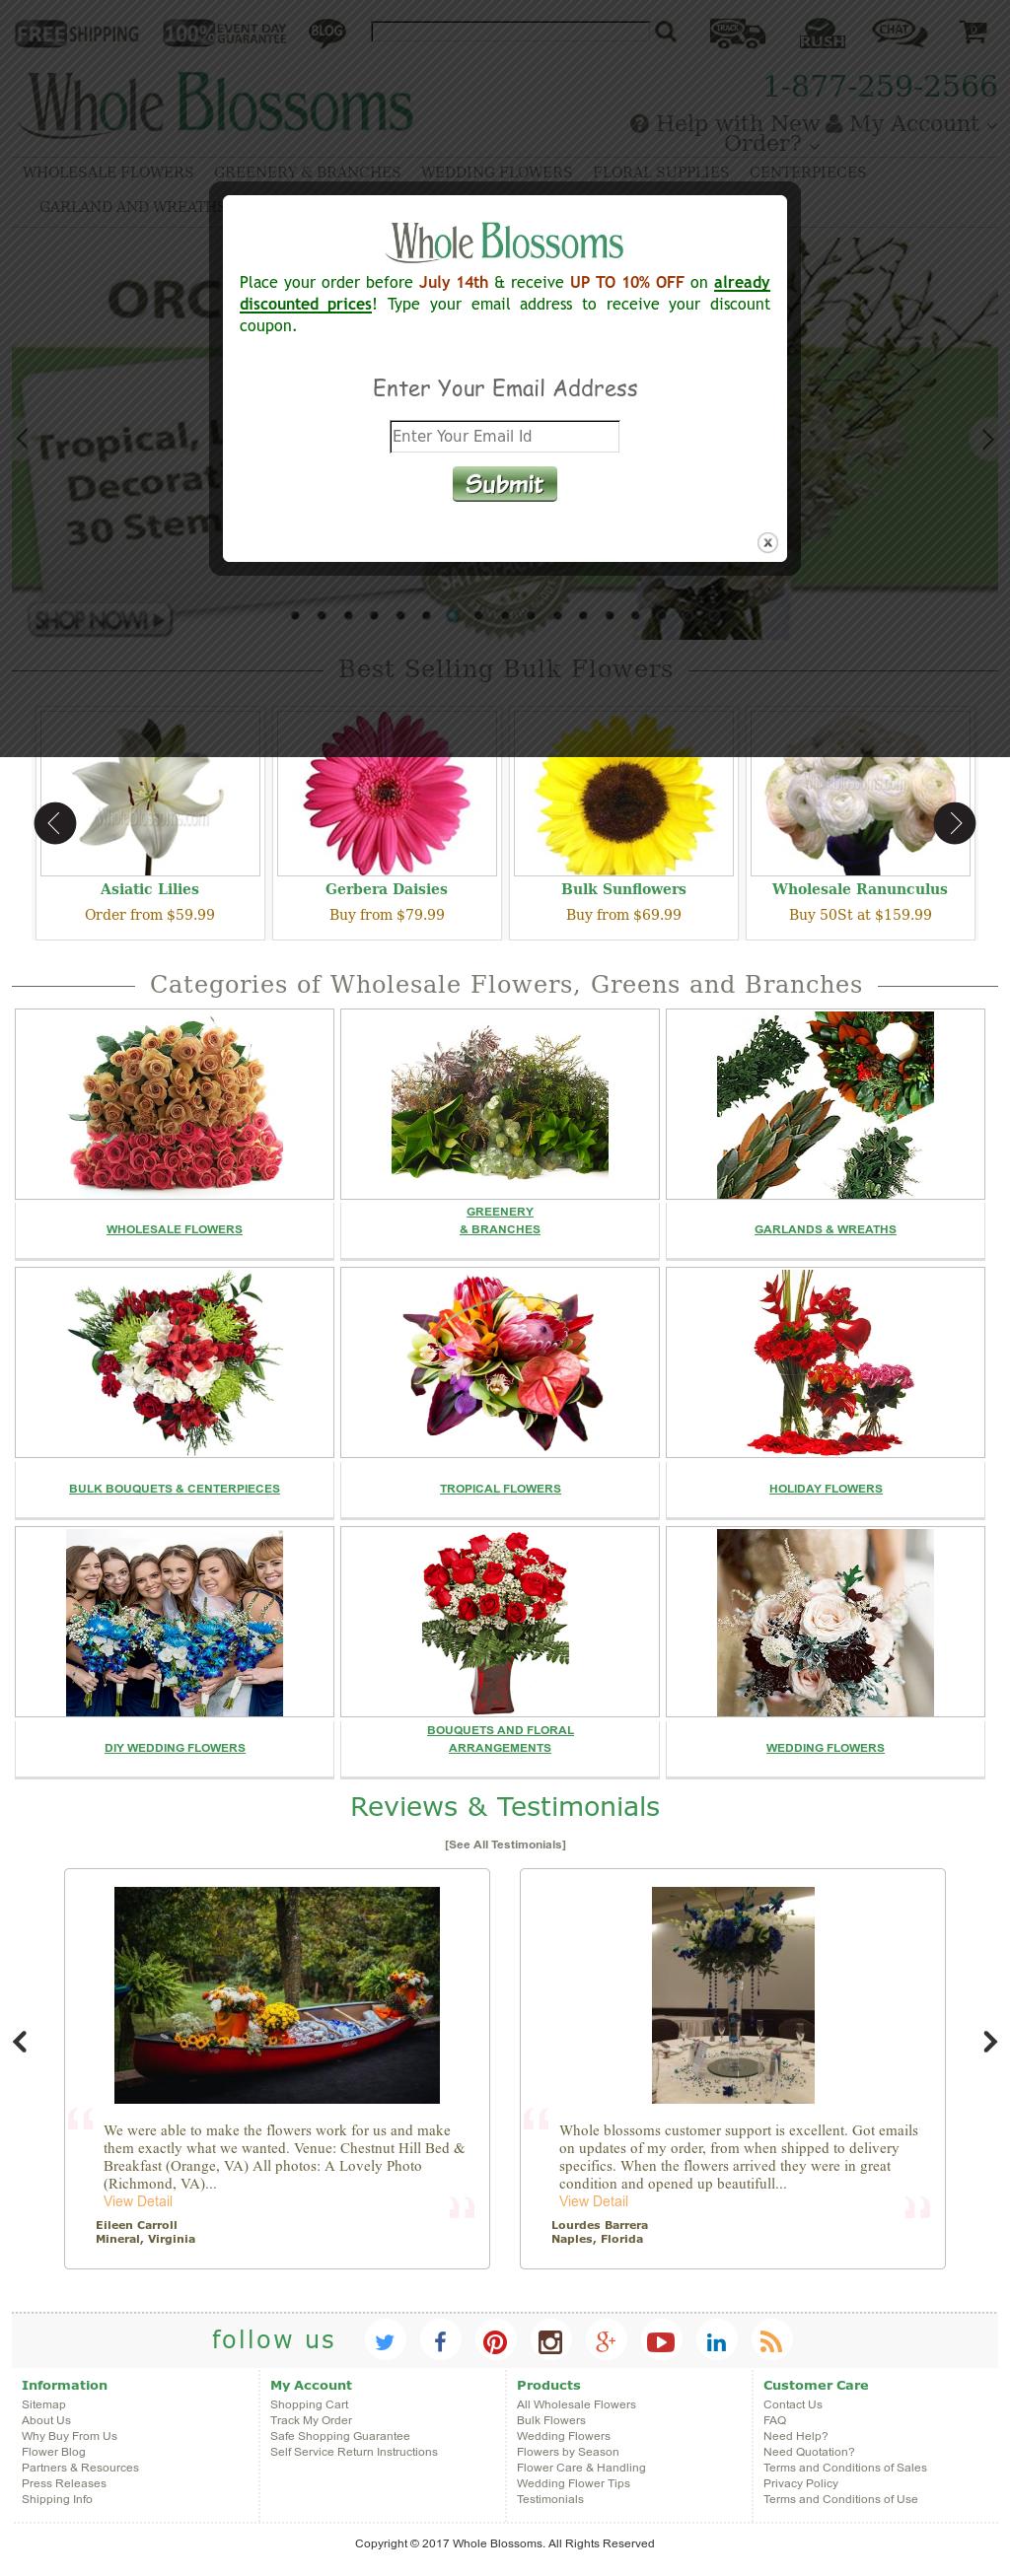 WholeBlossoms Competitors, Revenue and Employees - Owler Company Profile